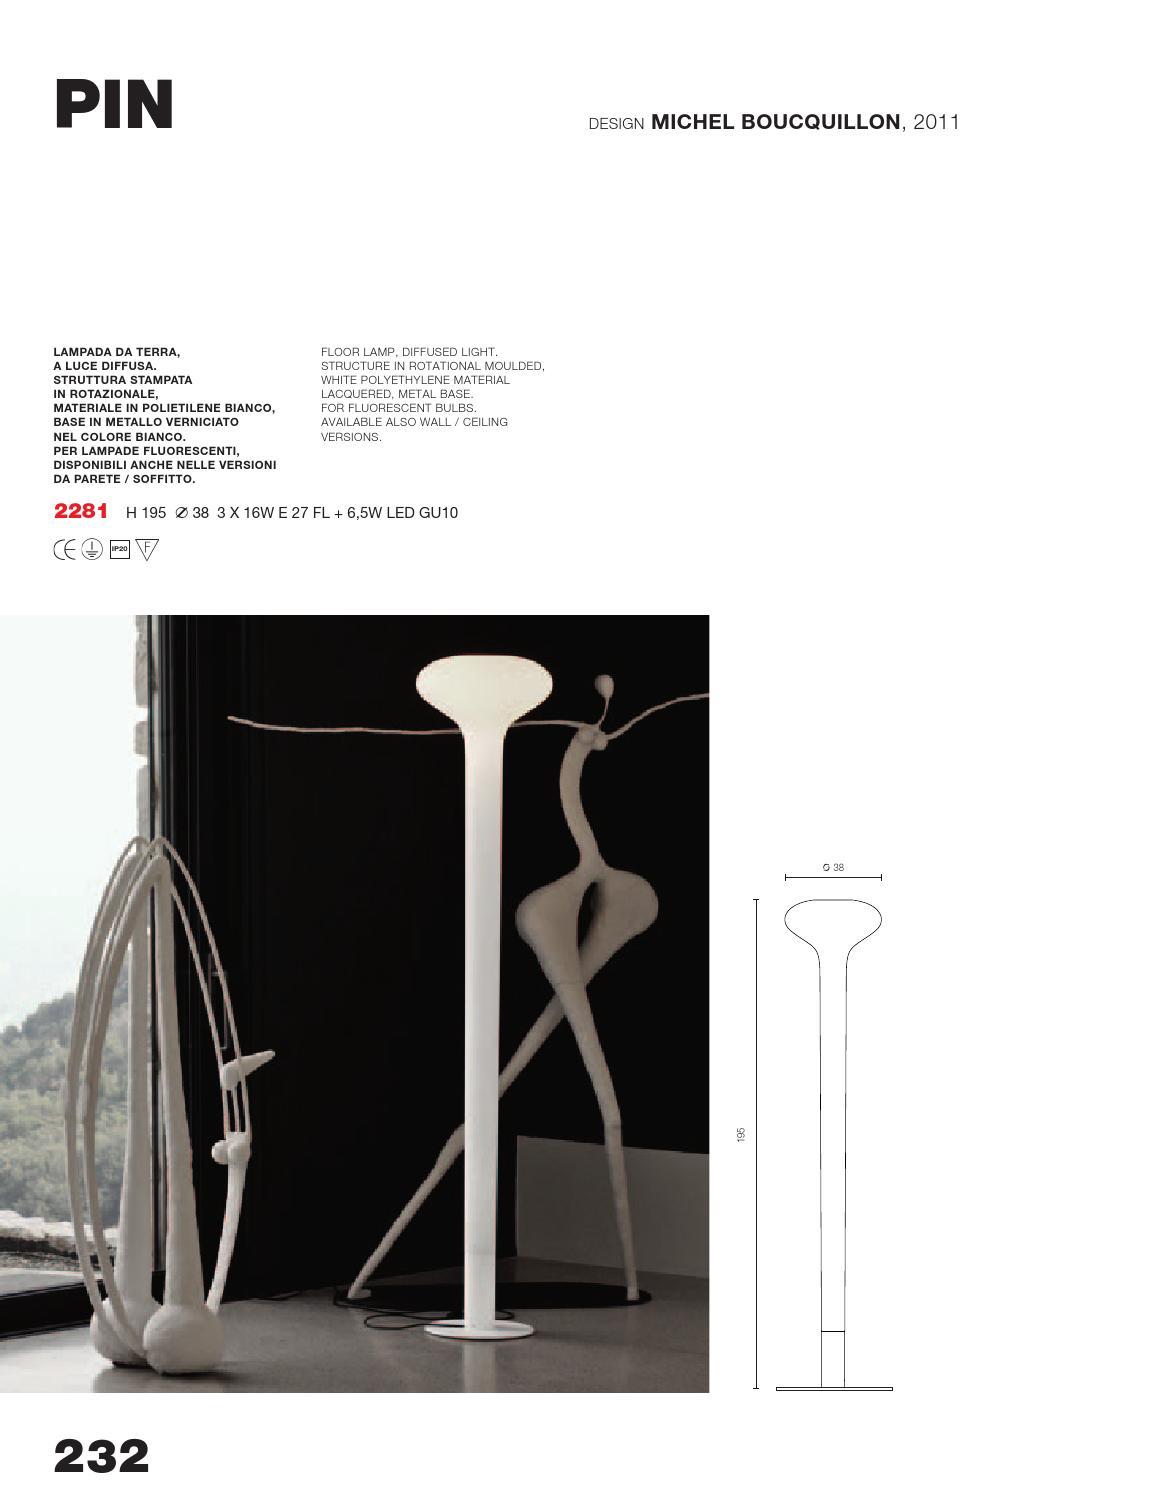 Lampade Al Neon Da Parete martinelli luce lampade by placed - issuu